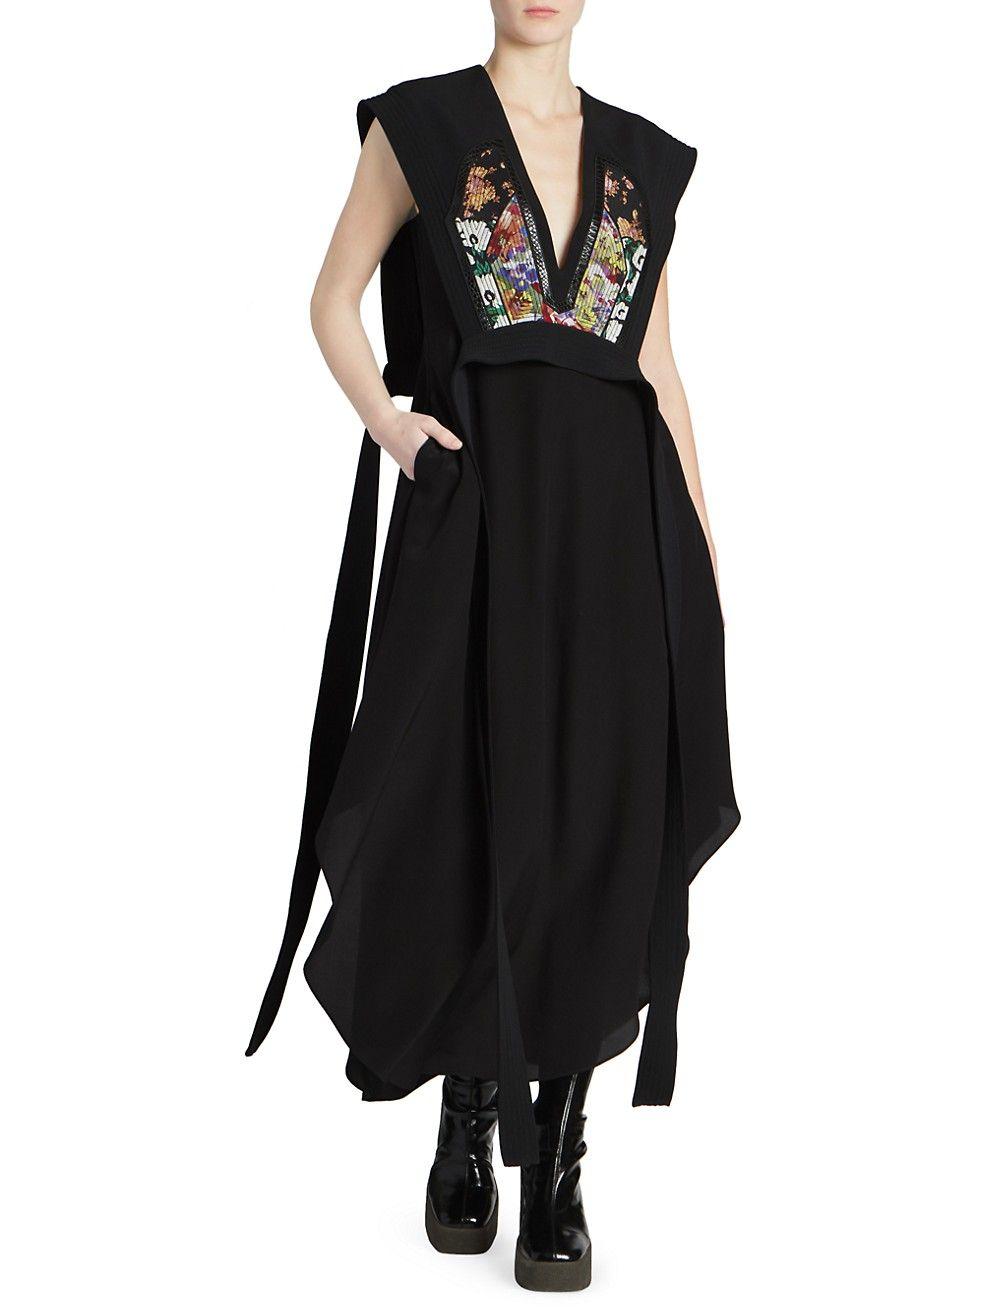 11+ Stella mccartney wedding dress sale ideas